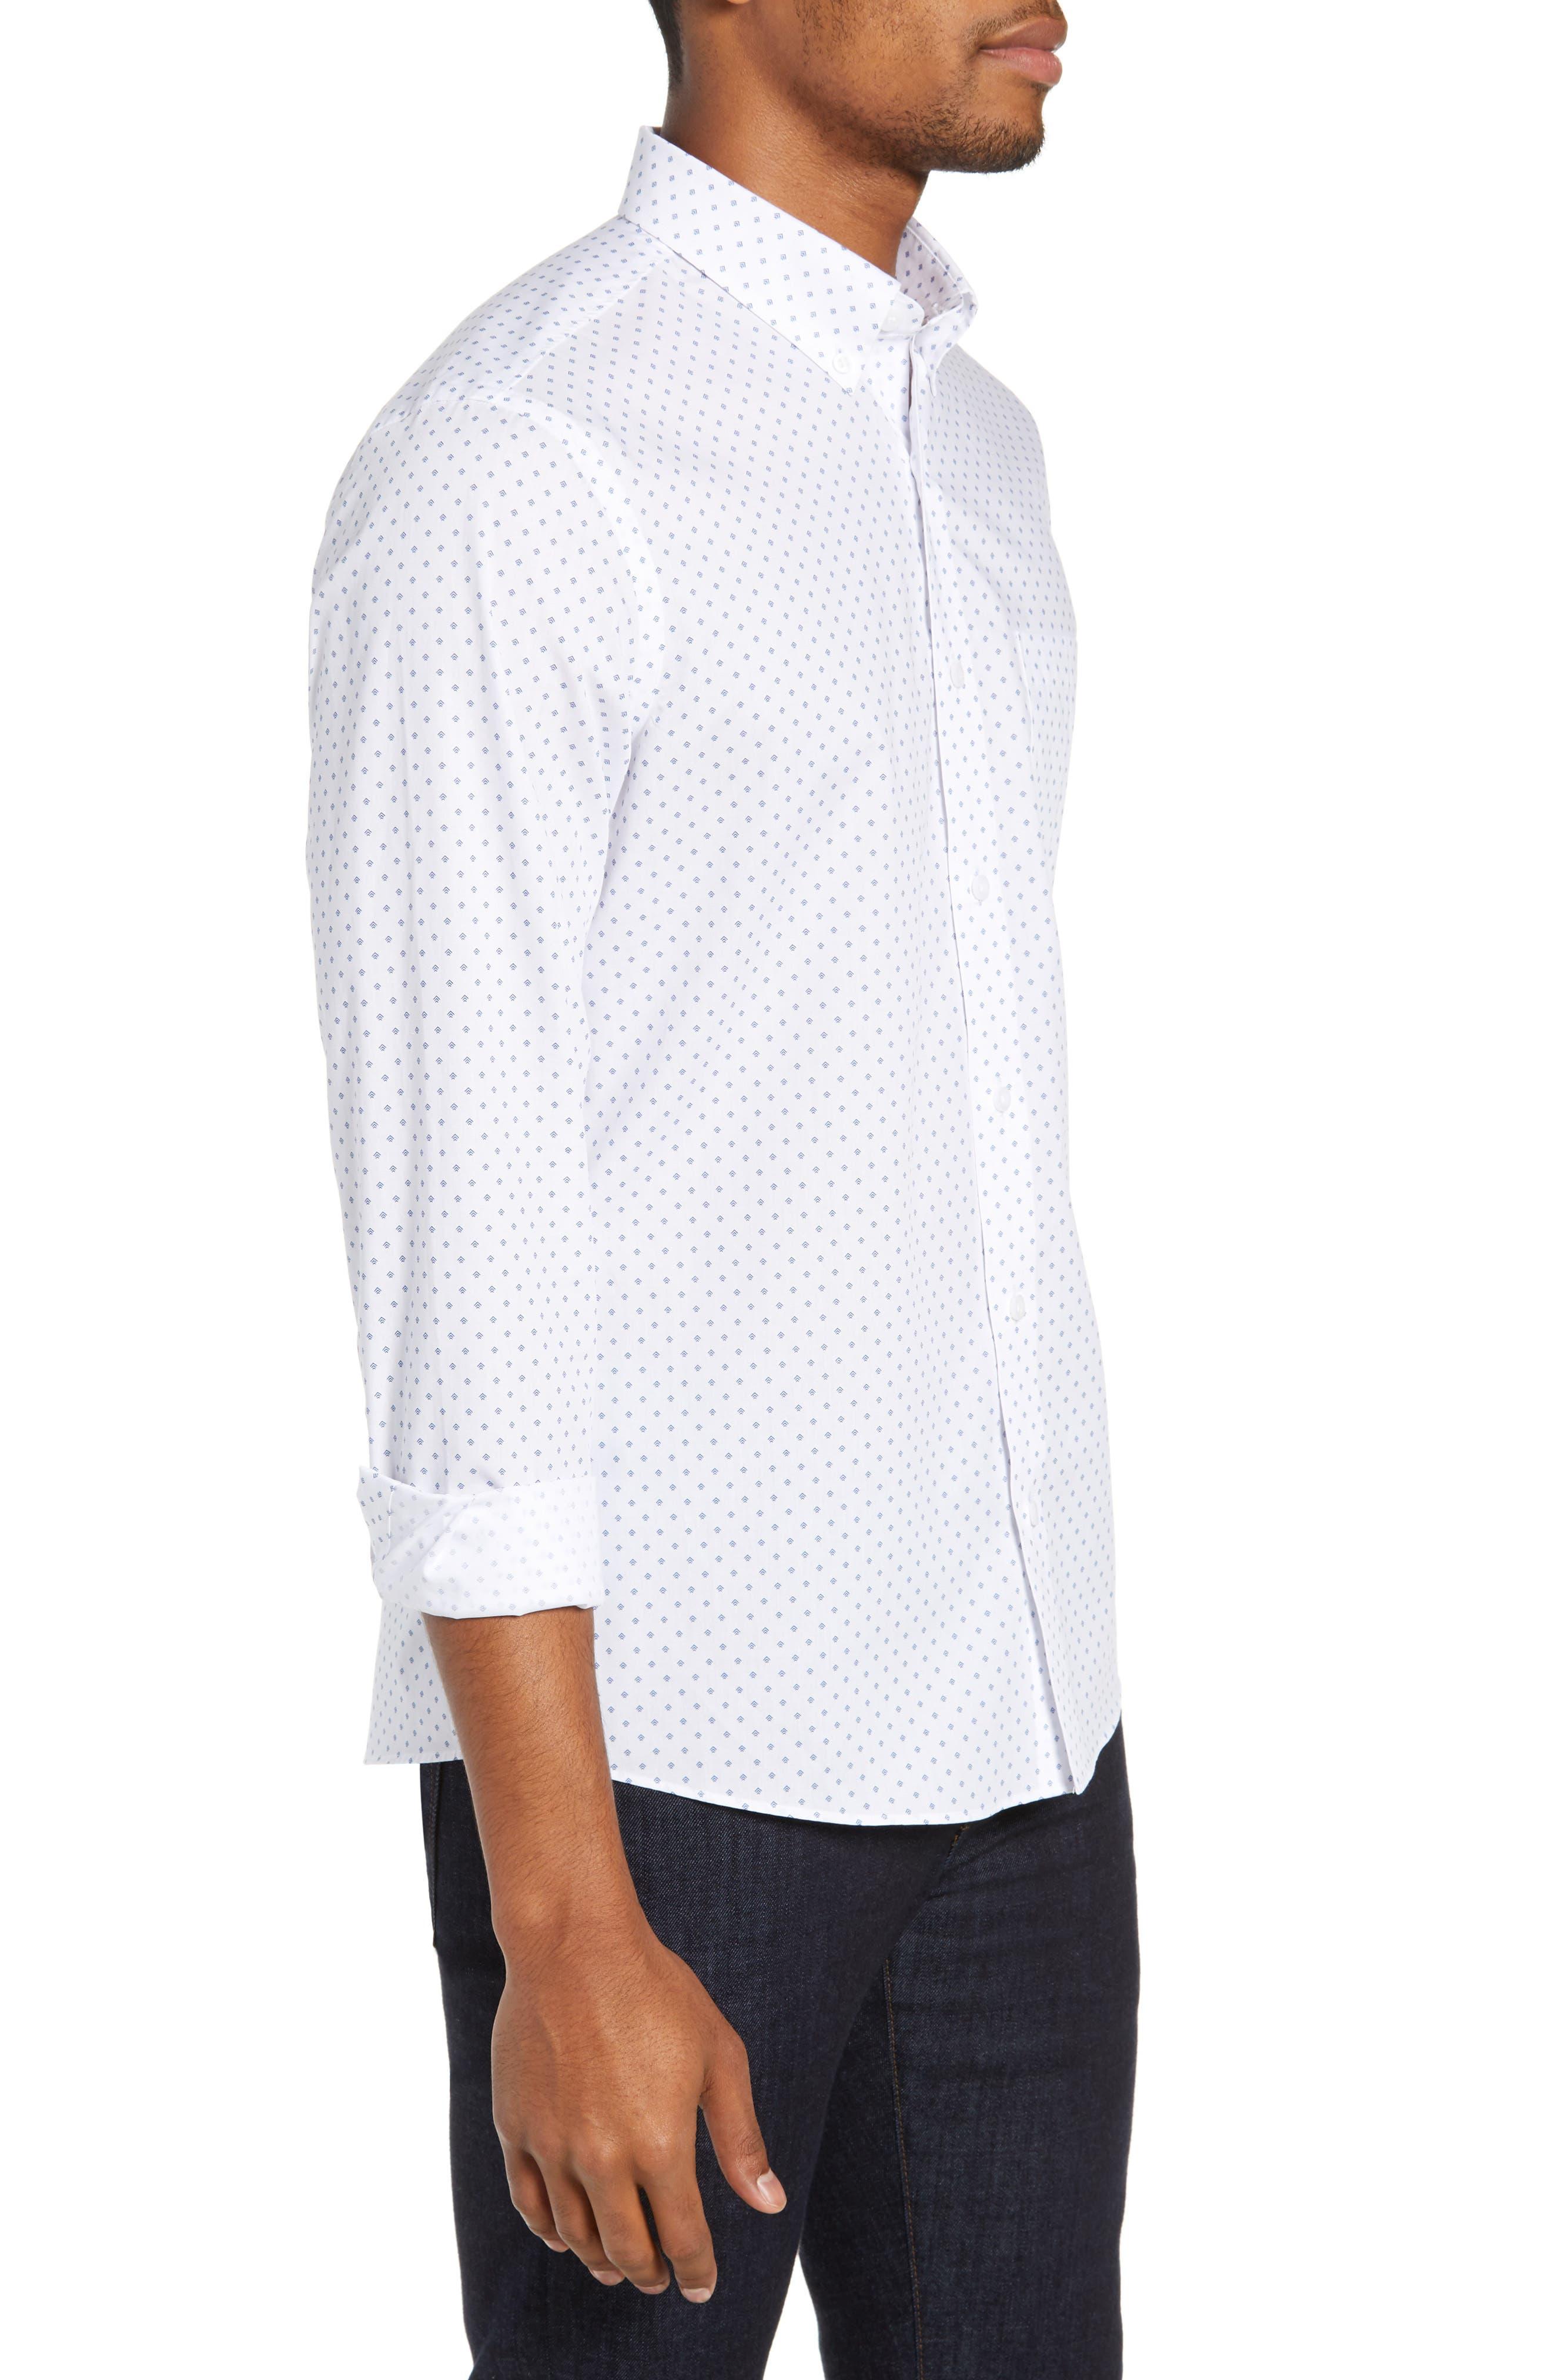 NORDSTROM MEN'S SHOP,                             Slim Fit Non-Iron Geo Print Sport Shirt,                             Alternate thumbnail 4, color,                             100